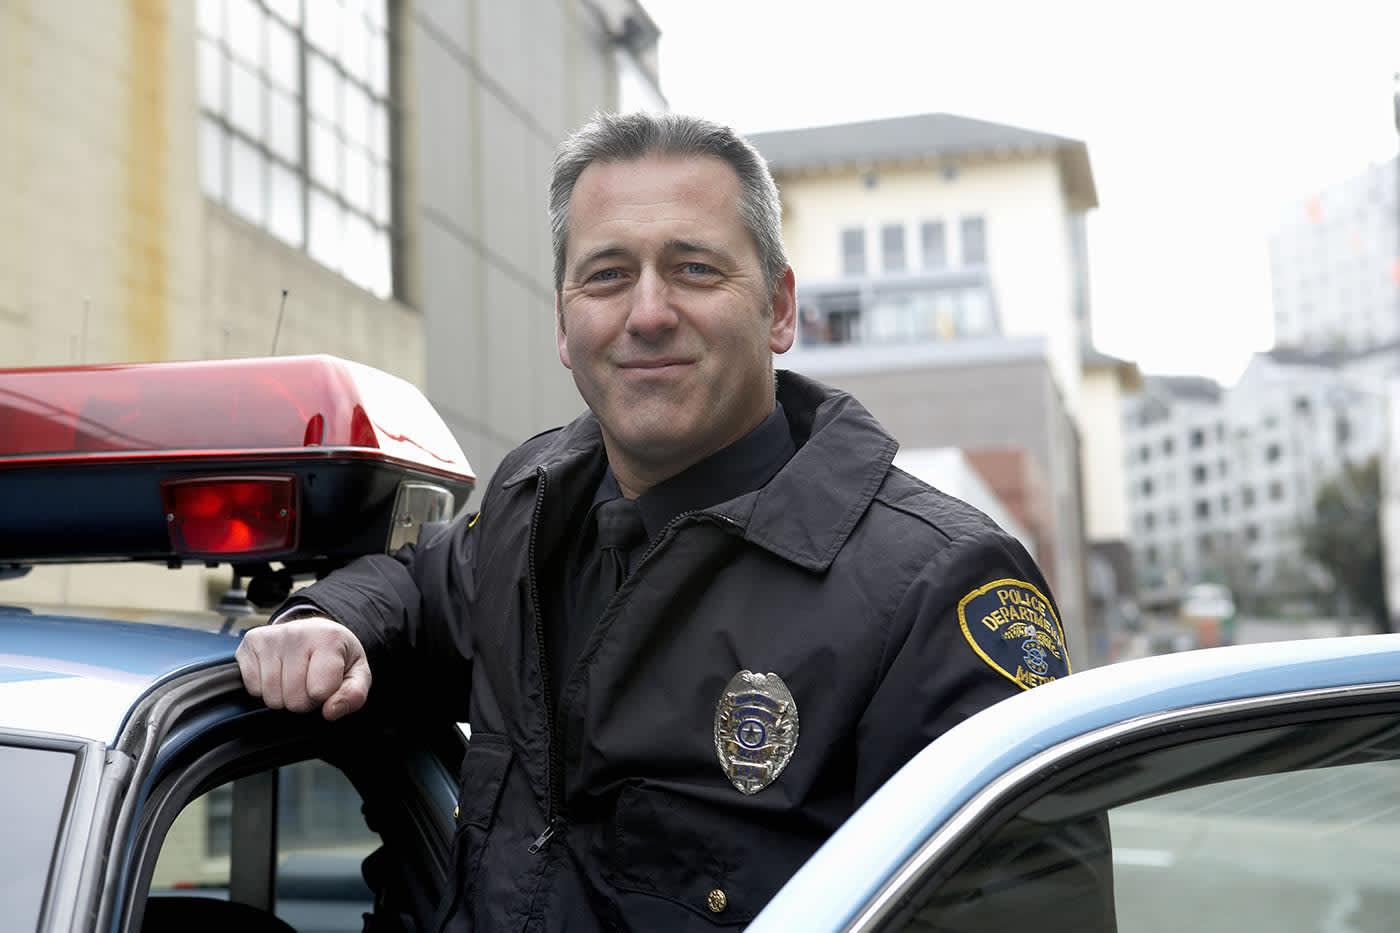 Hero Image Deputy Sheriff: Career Guide